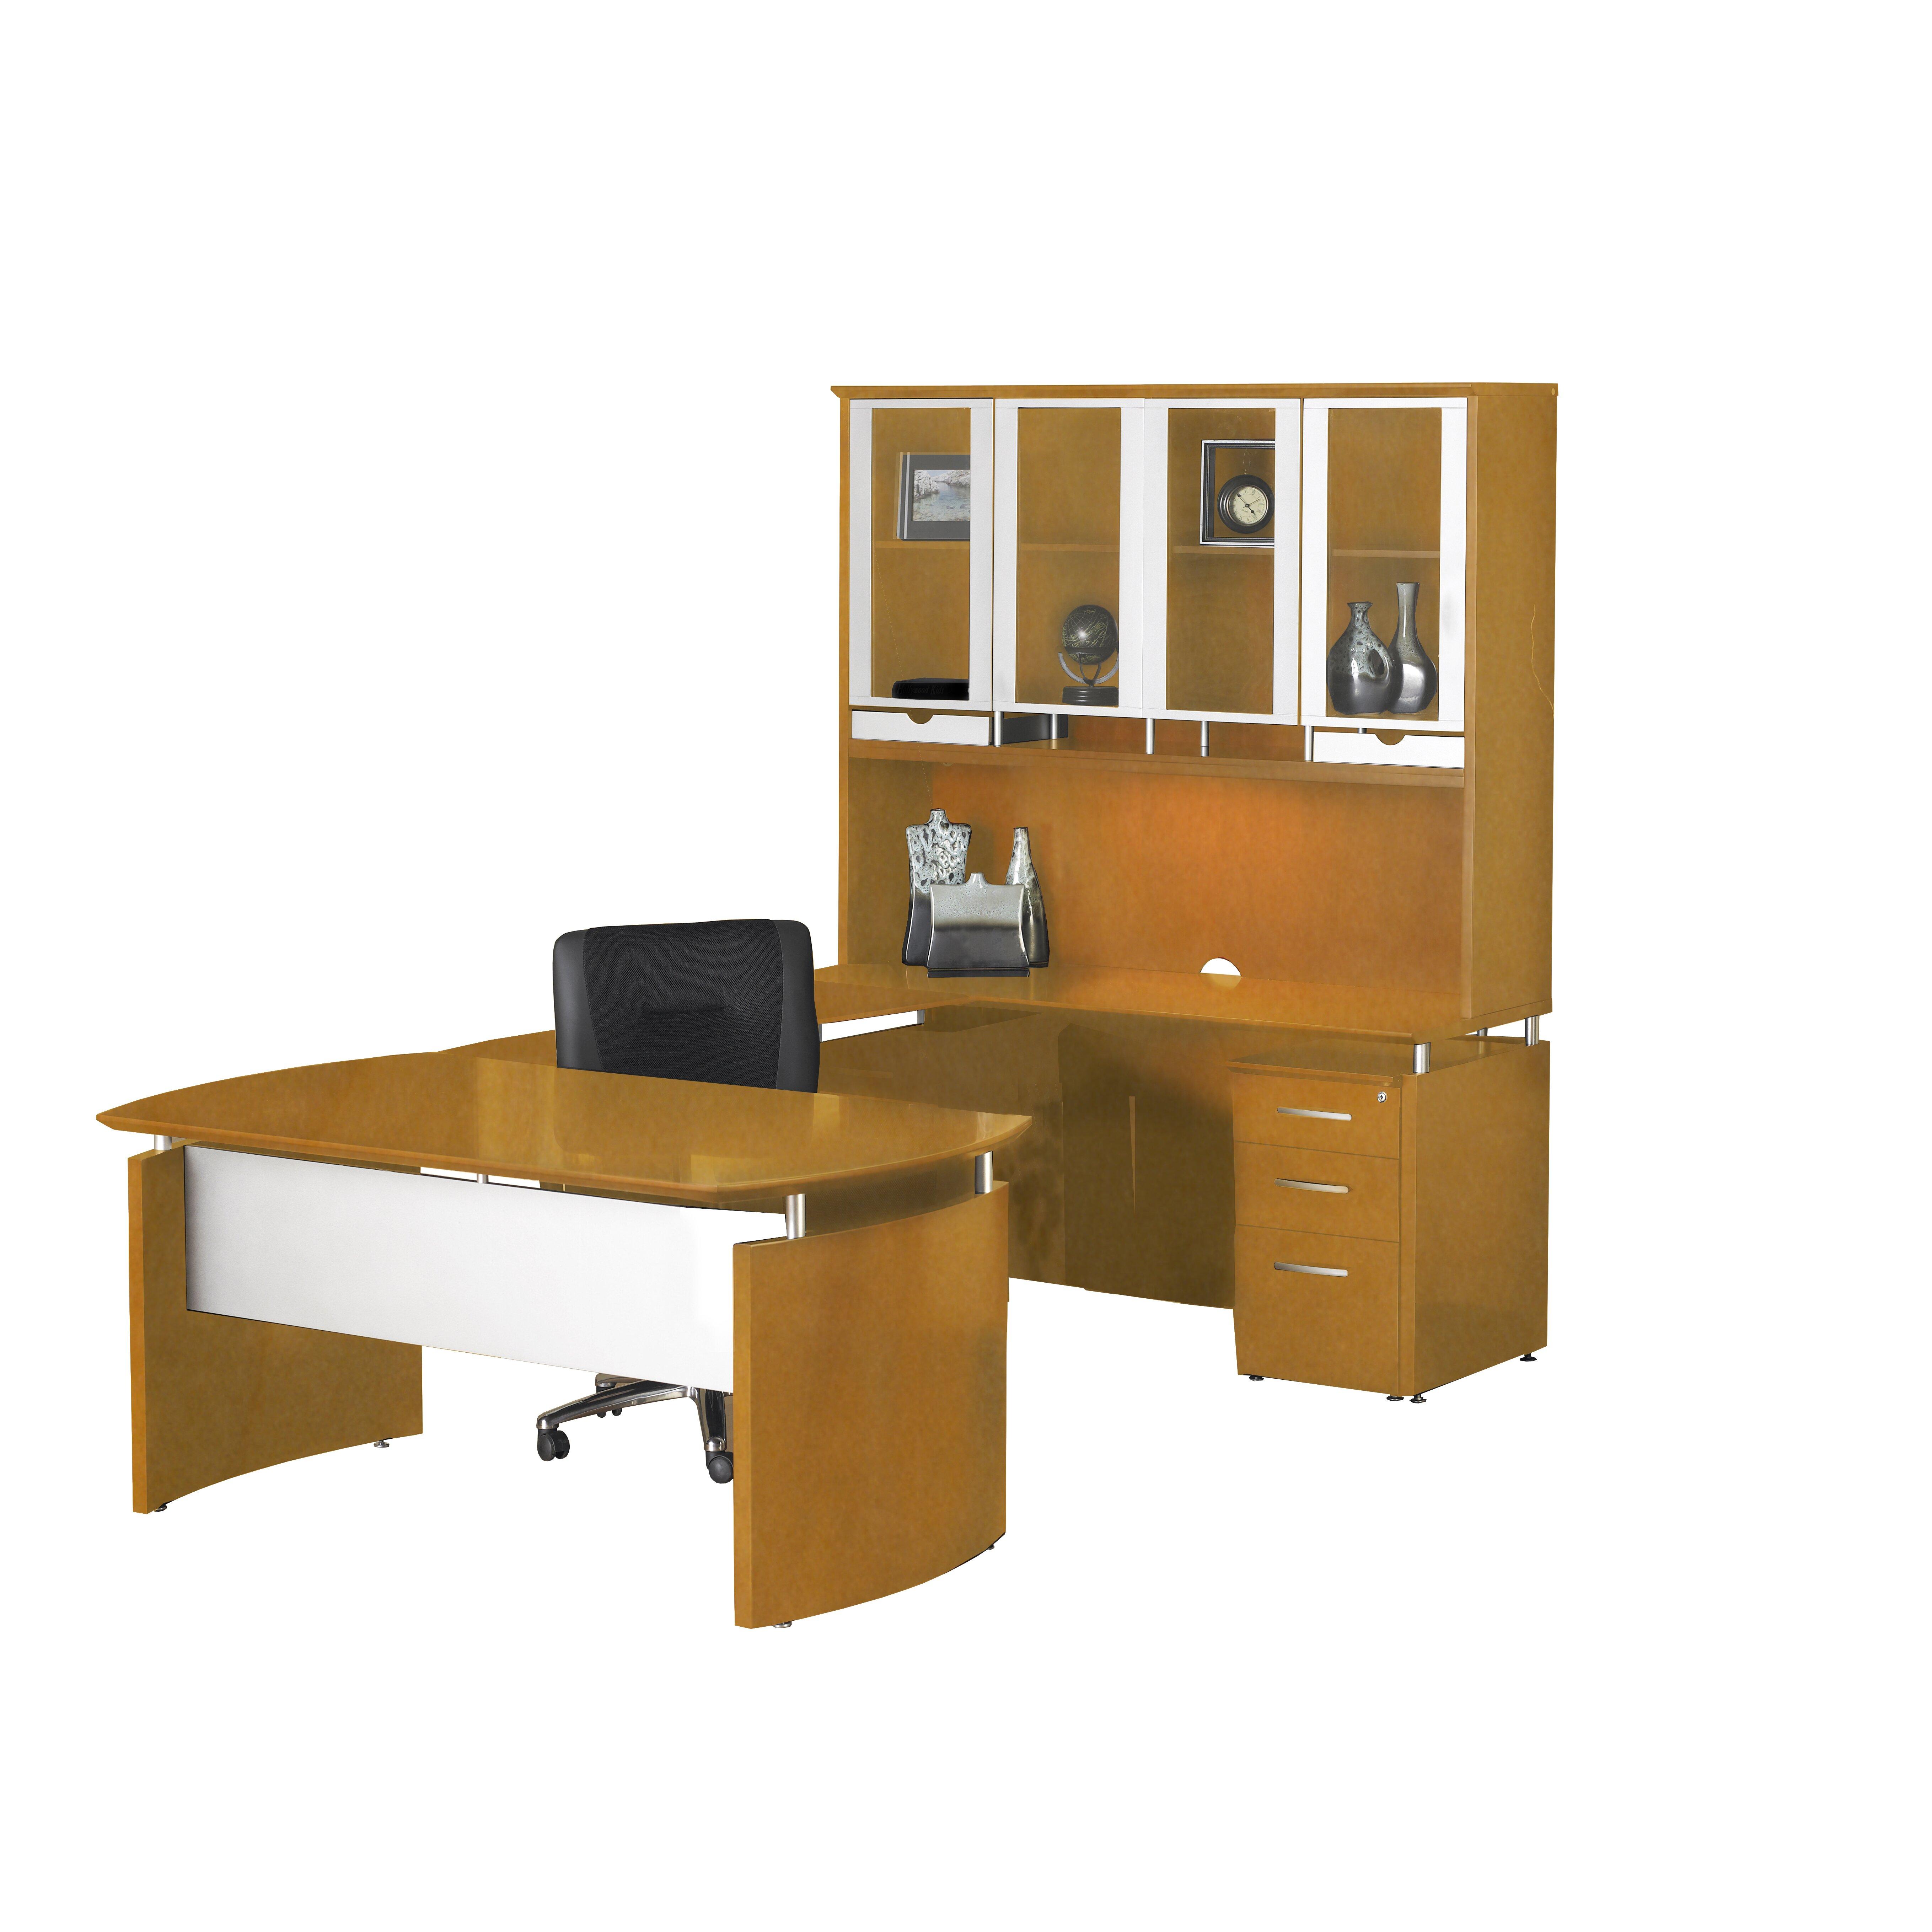 Office Furniture Mirrored Bathroom Cabi Best Free